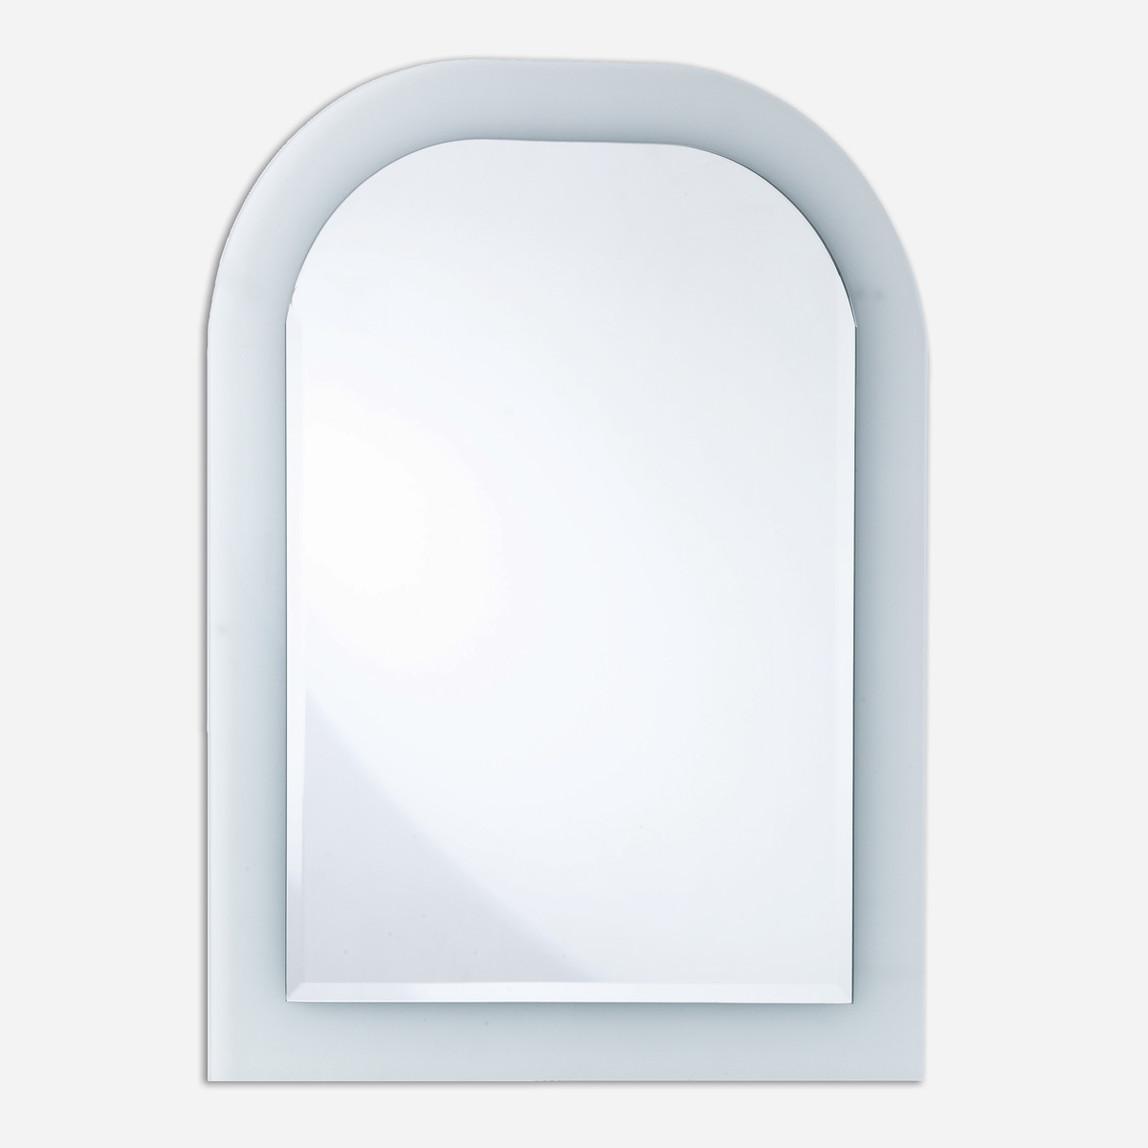 Ağrı Kubbeli Ayna B.Kumlamalı